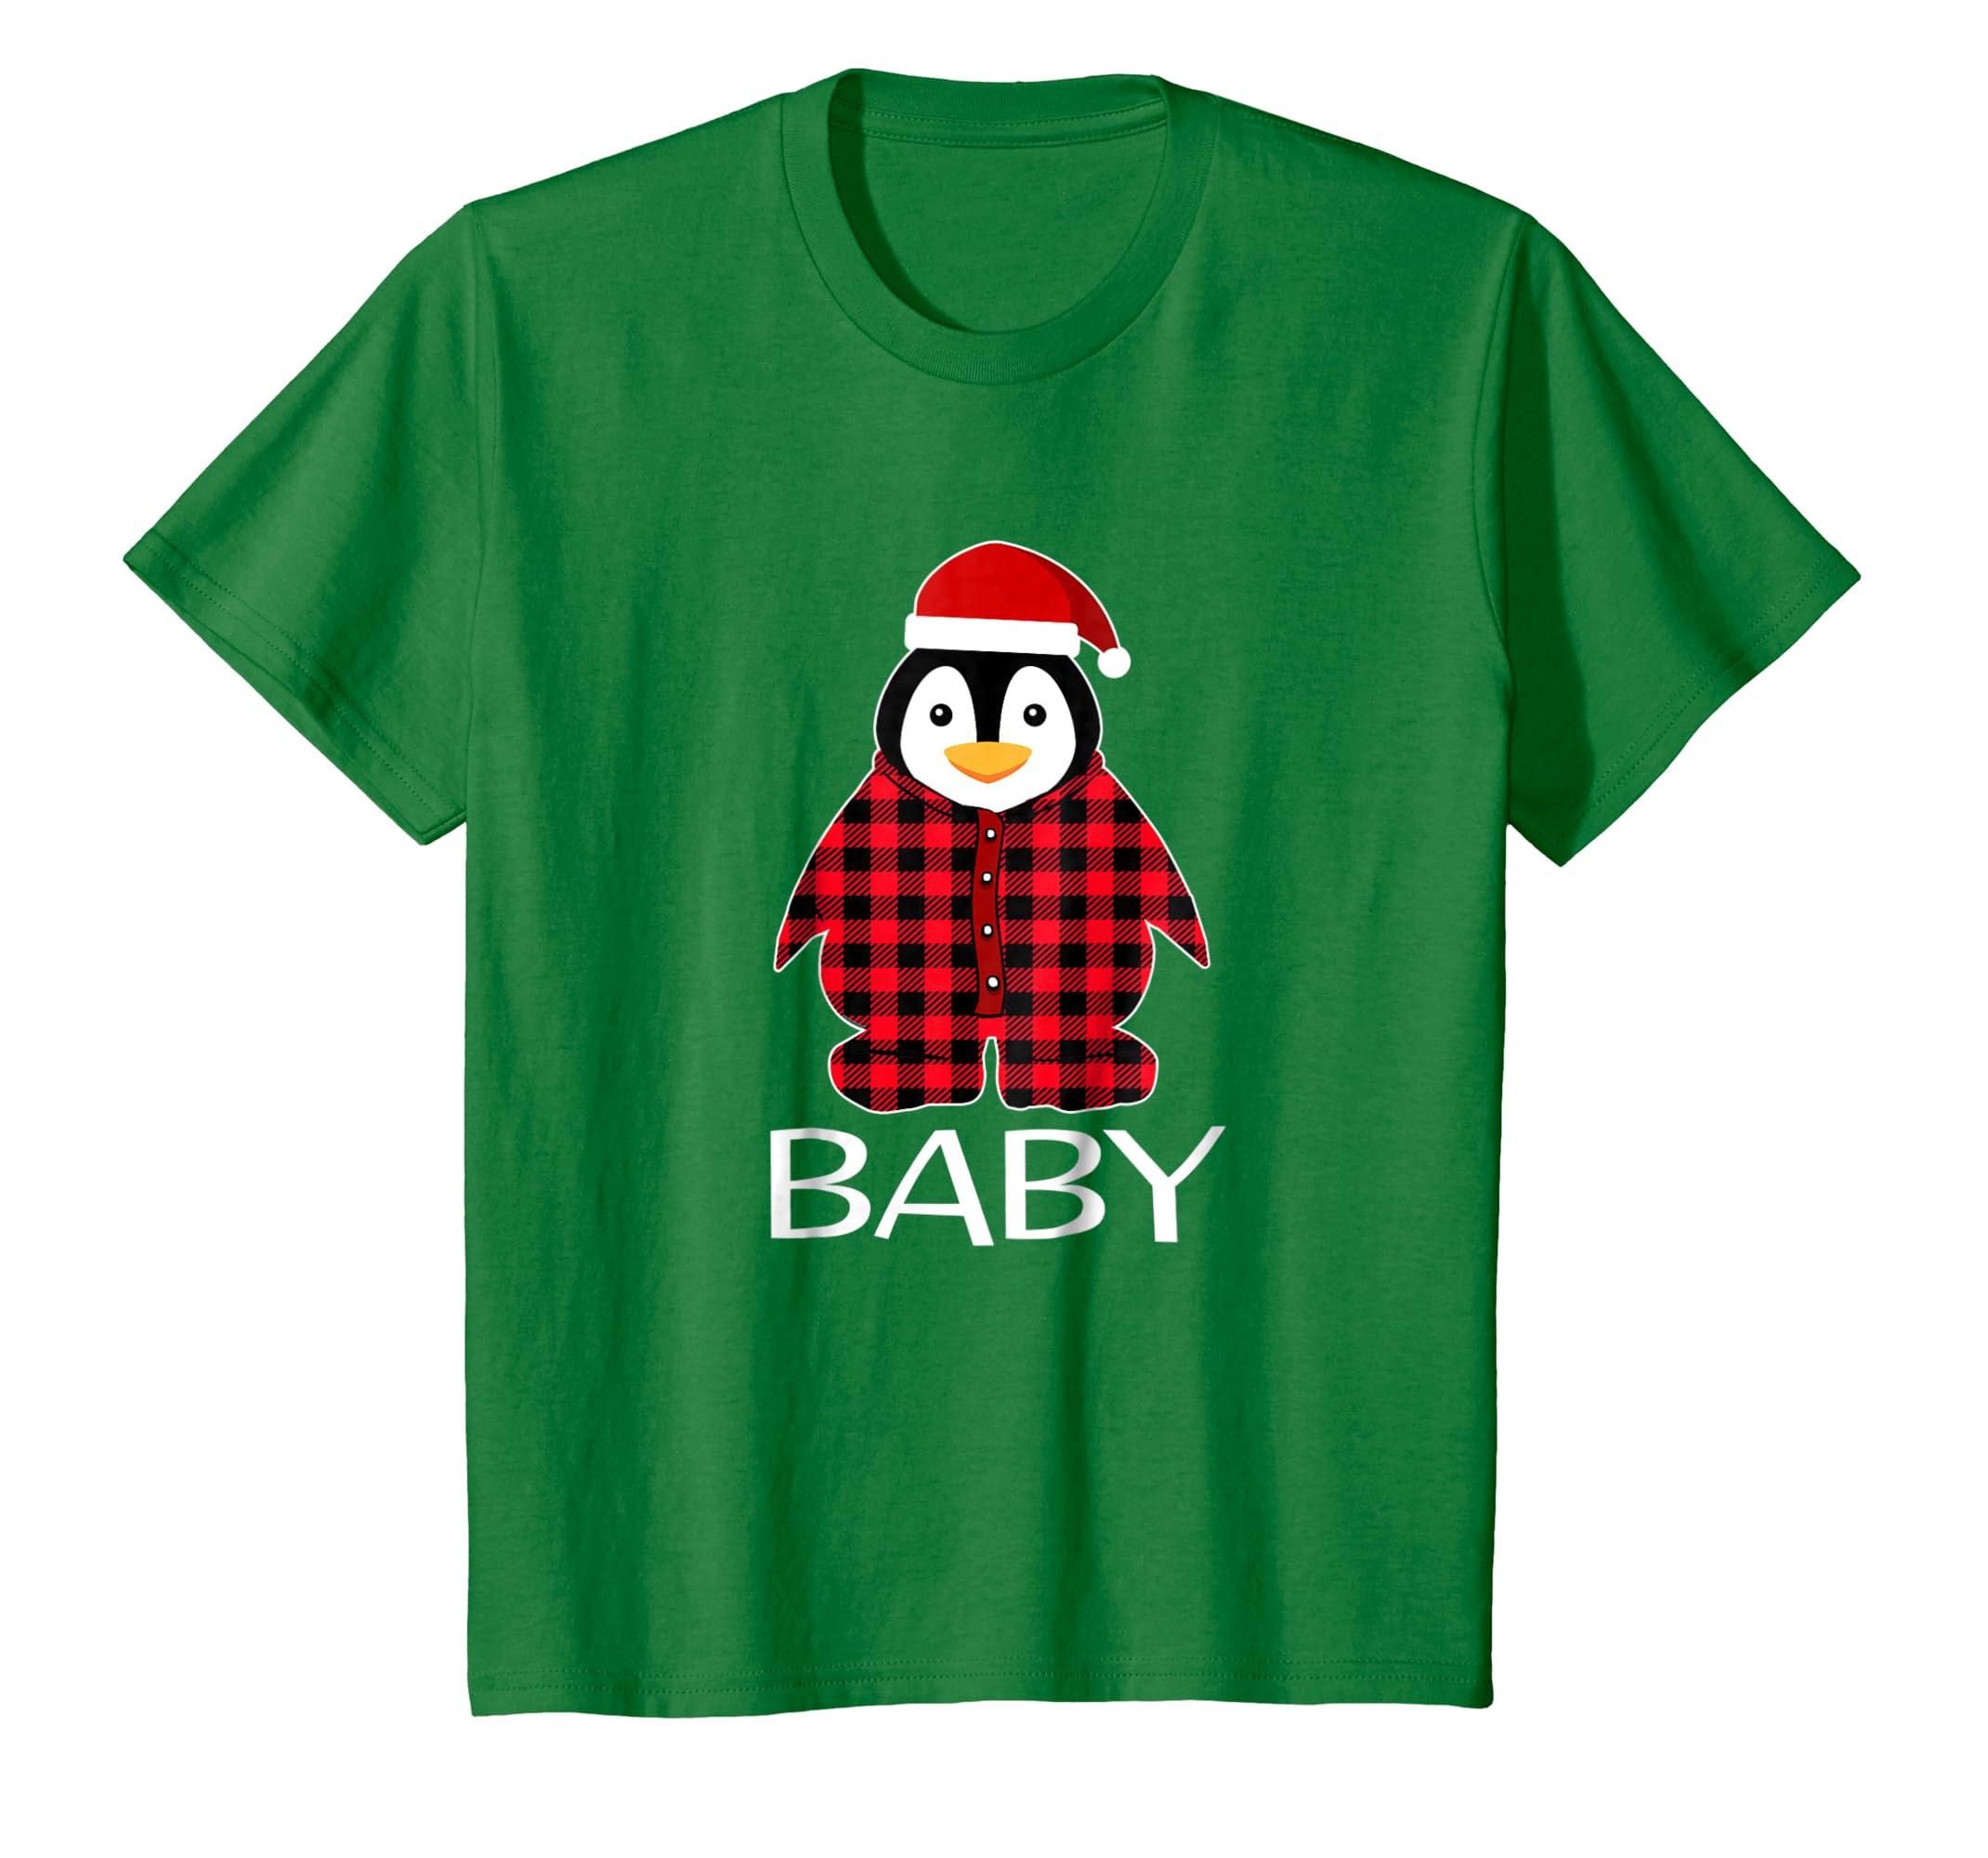 Baby Penguin Pajamas Ugly Family Christmas Season Tshirt-Teechatpro